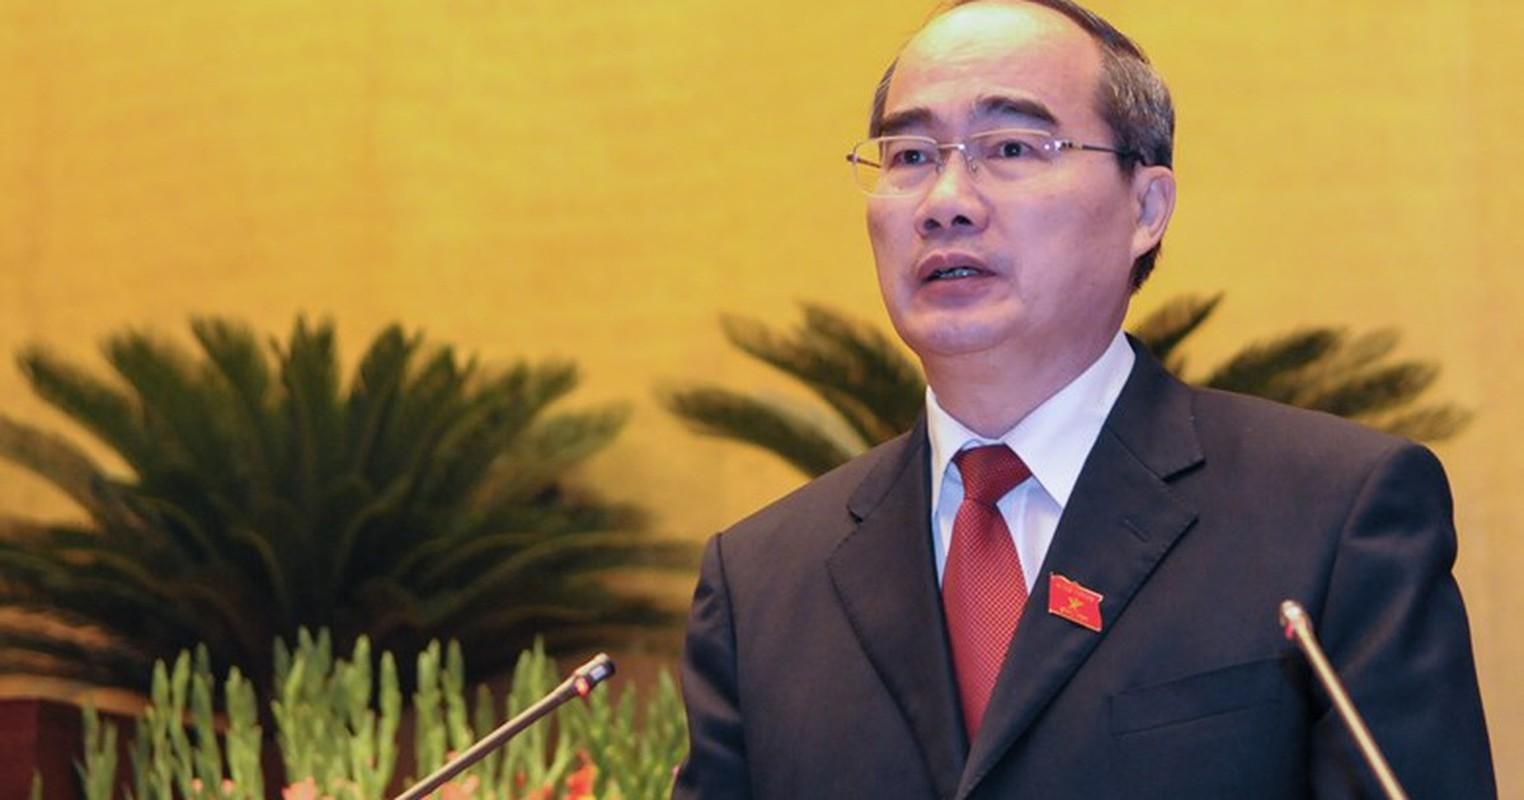 Cu tri dong y 100% gioi thieu ong Nguyen Thien Nhan ung cu DBQH-Hinh-7